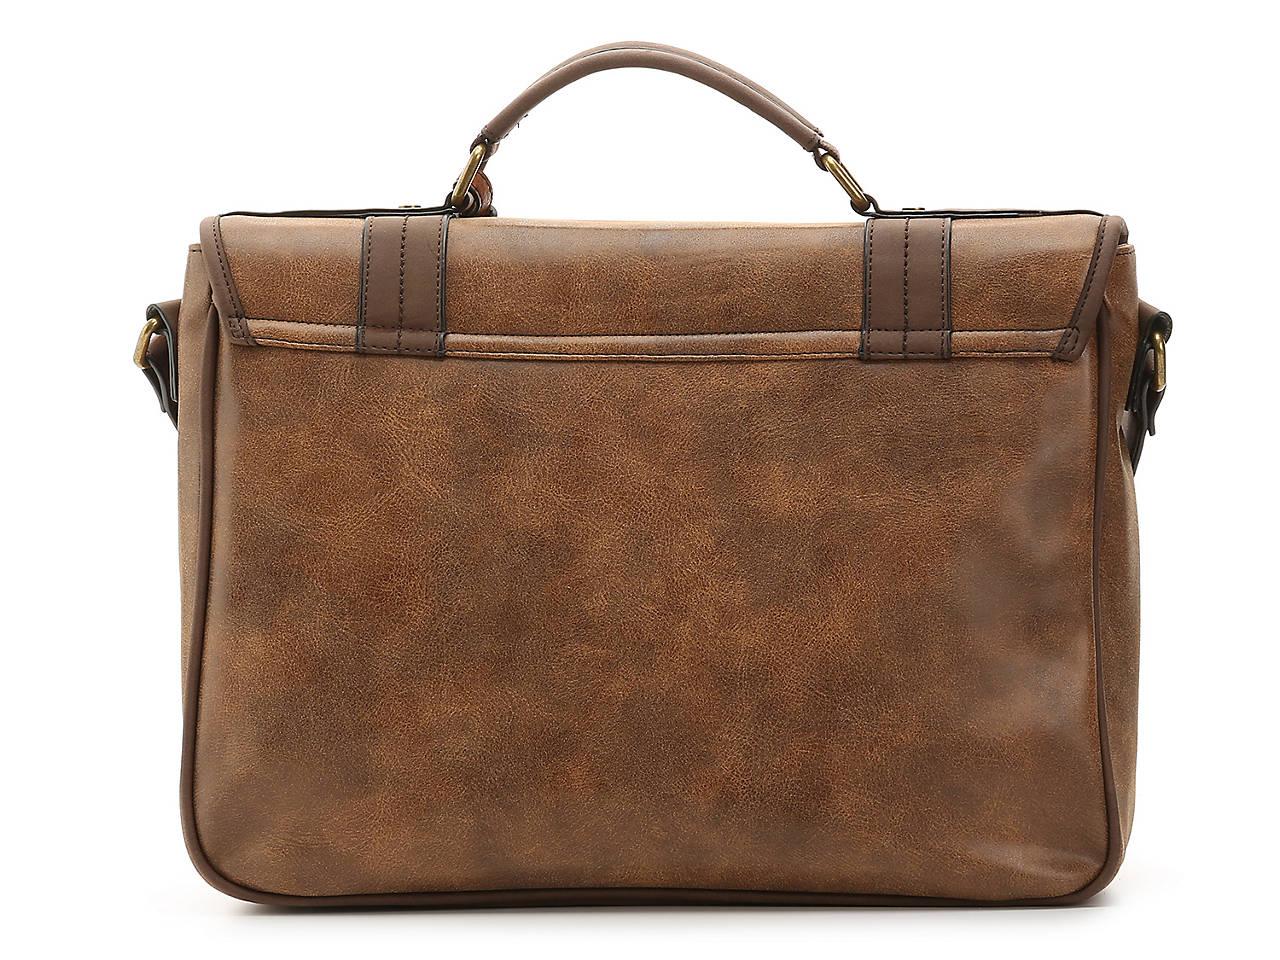 d64b253afae5 Aldo Unelan Buckle Messenger Bag Men s Handbags   Accessories